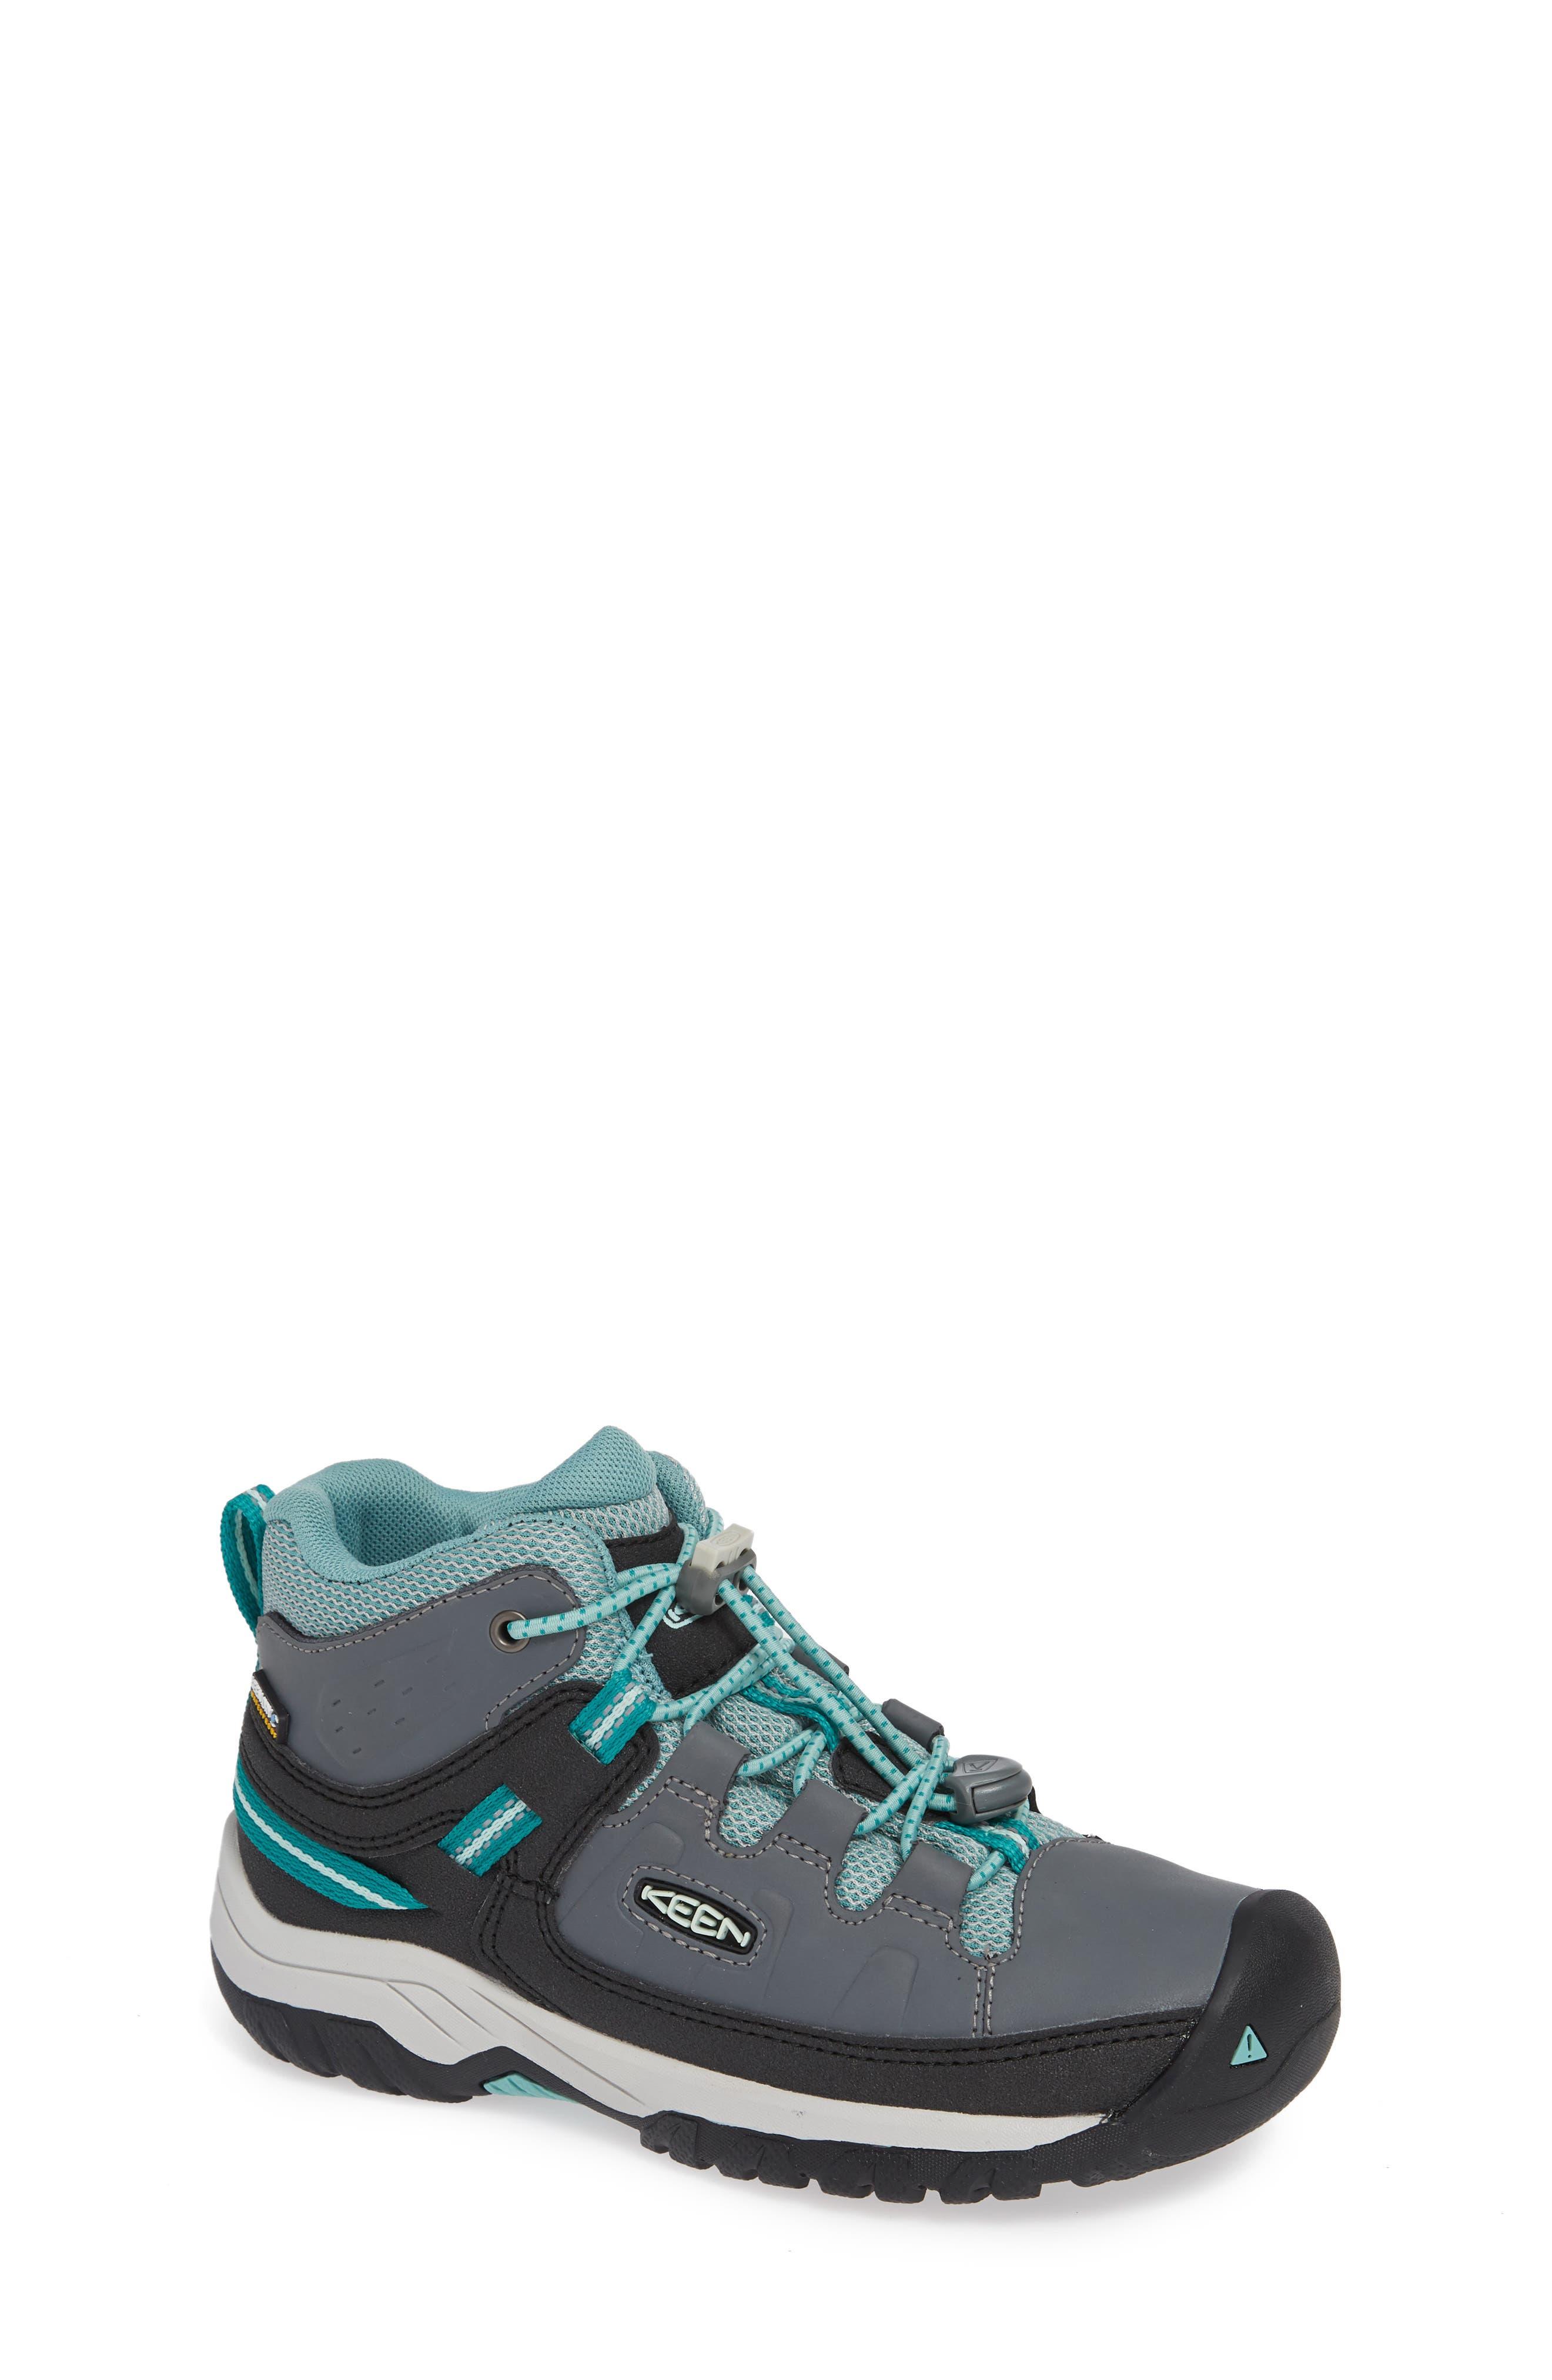 Targhee Mid Waterproof Hiking Boot,                         Main,                         color, GREY/ WASABI